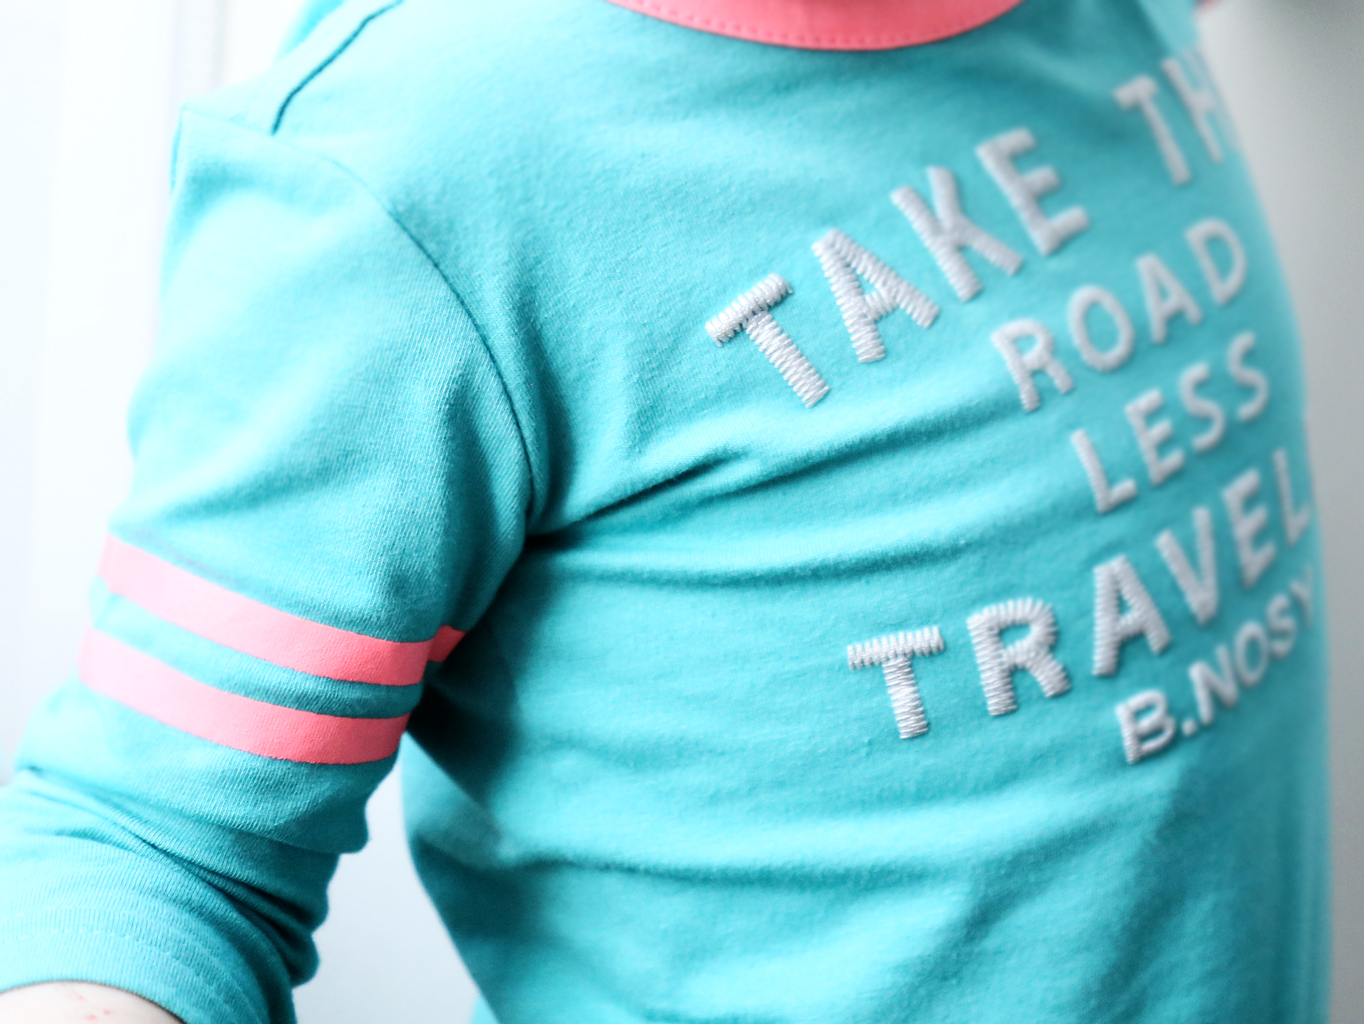 img_0825-minibelle-nl b.nosy, zomercollectie, 2017, sneak peek, review, kindermode, kindermodeblog, kinderkleding, trends zomer 2017, meisjes kleding